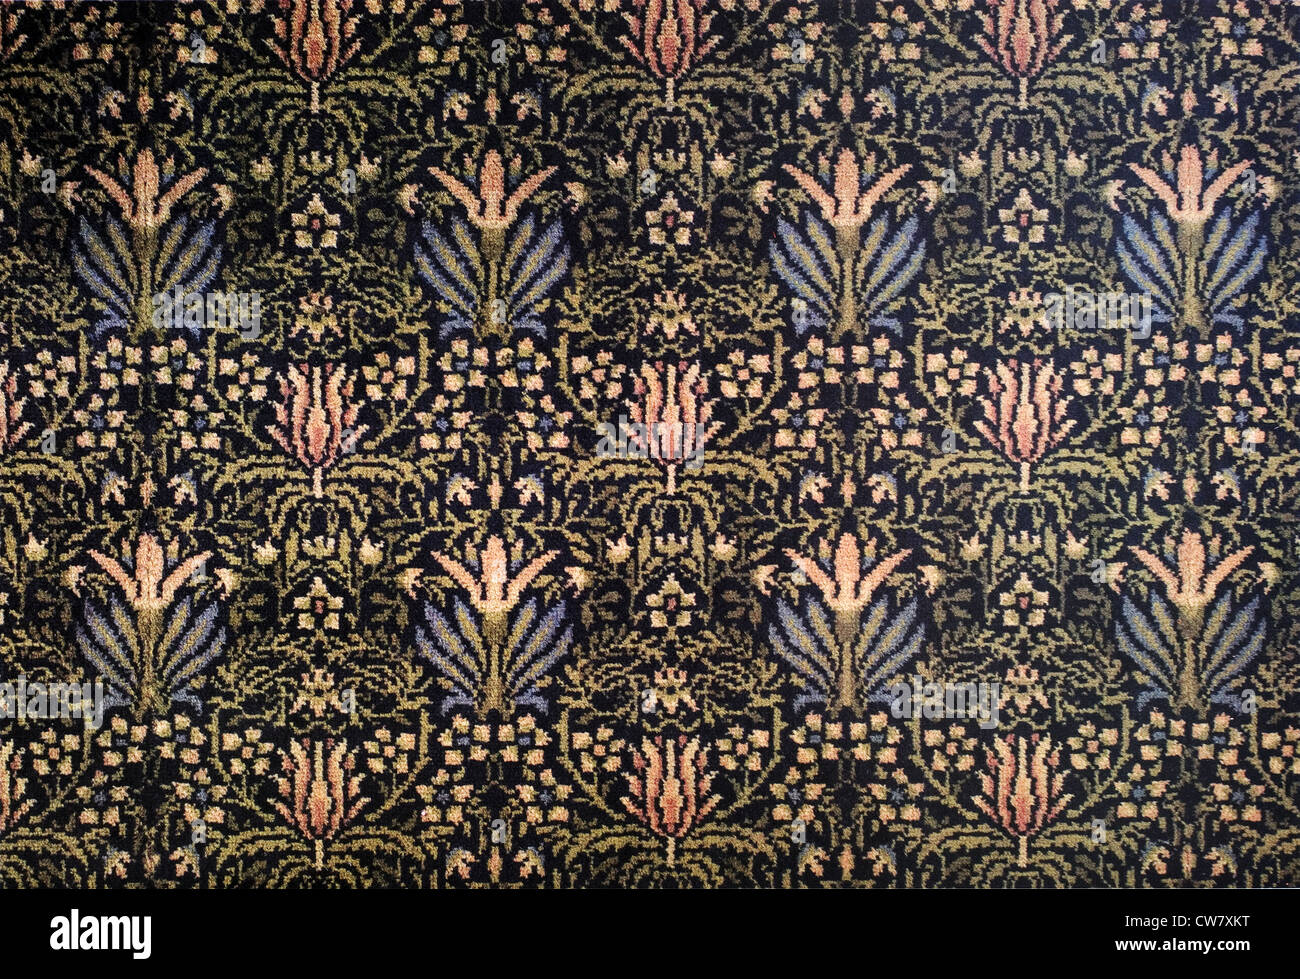 Golden fronda tessuto tessile Immagini Stock